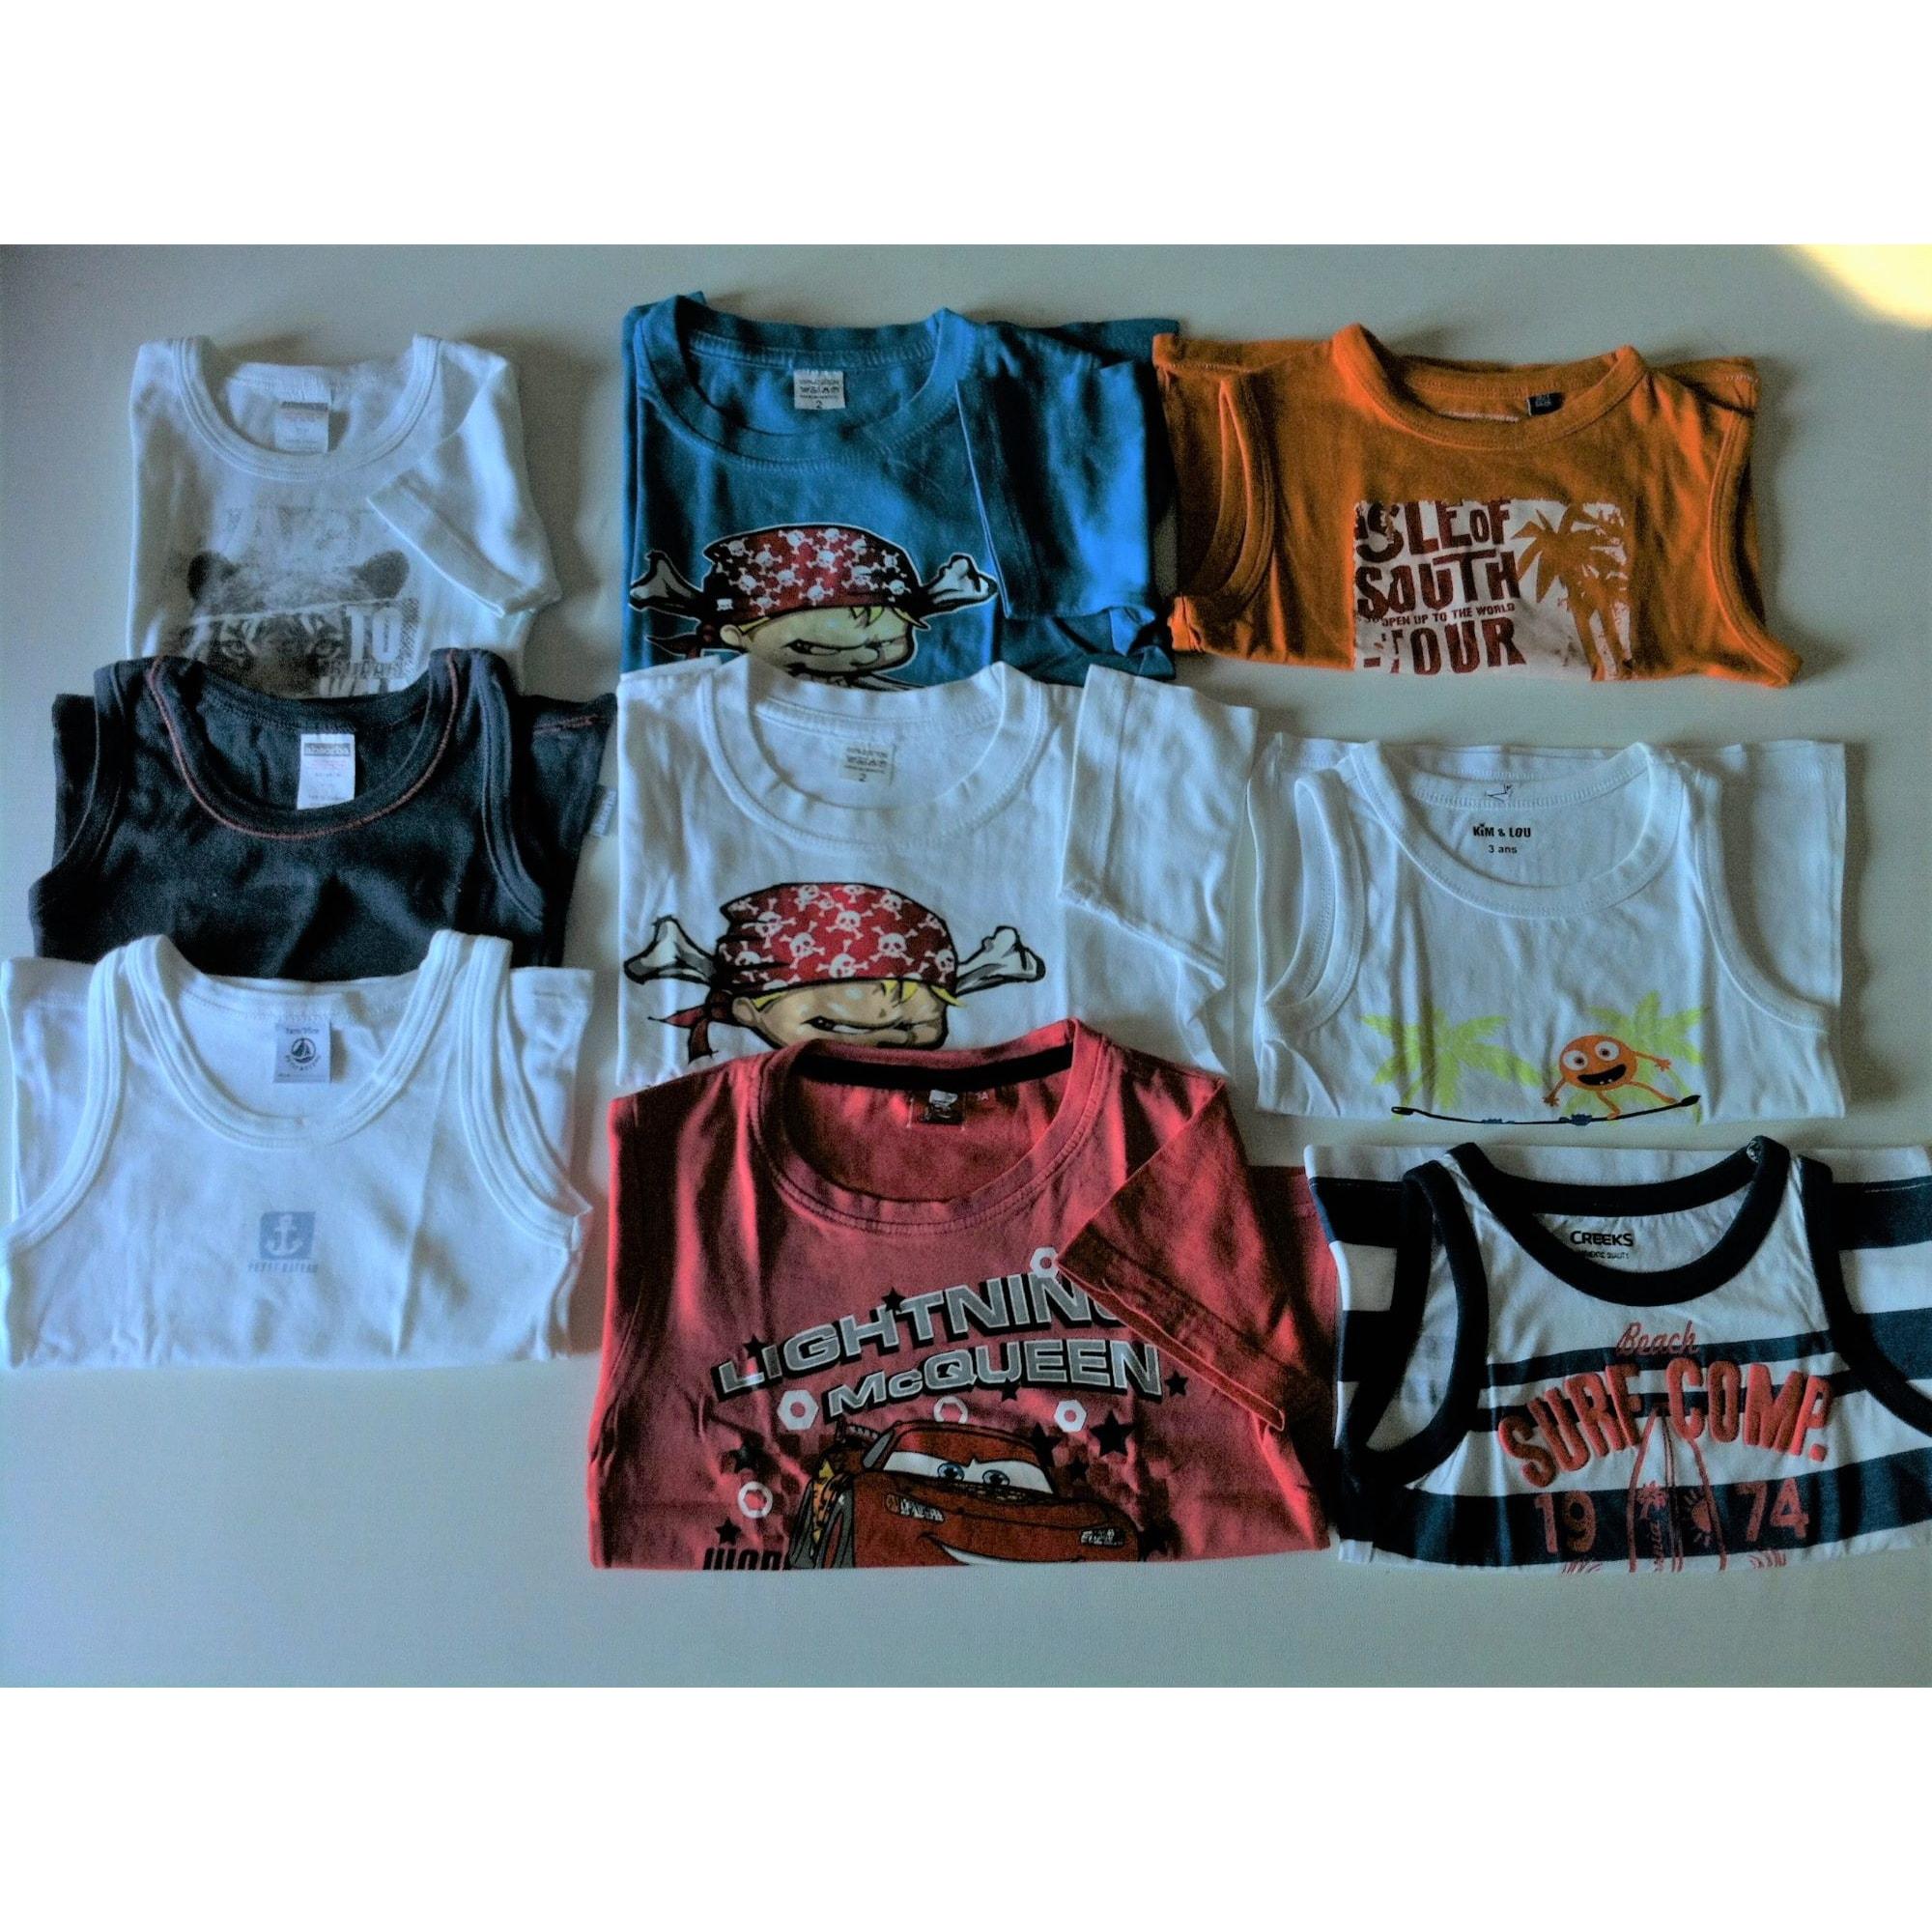 Tee-shirt MARQUE INCONNUE blanc, bleu, rouge, orange